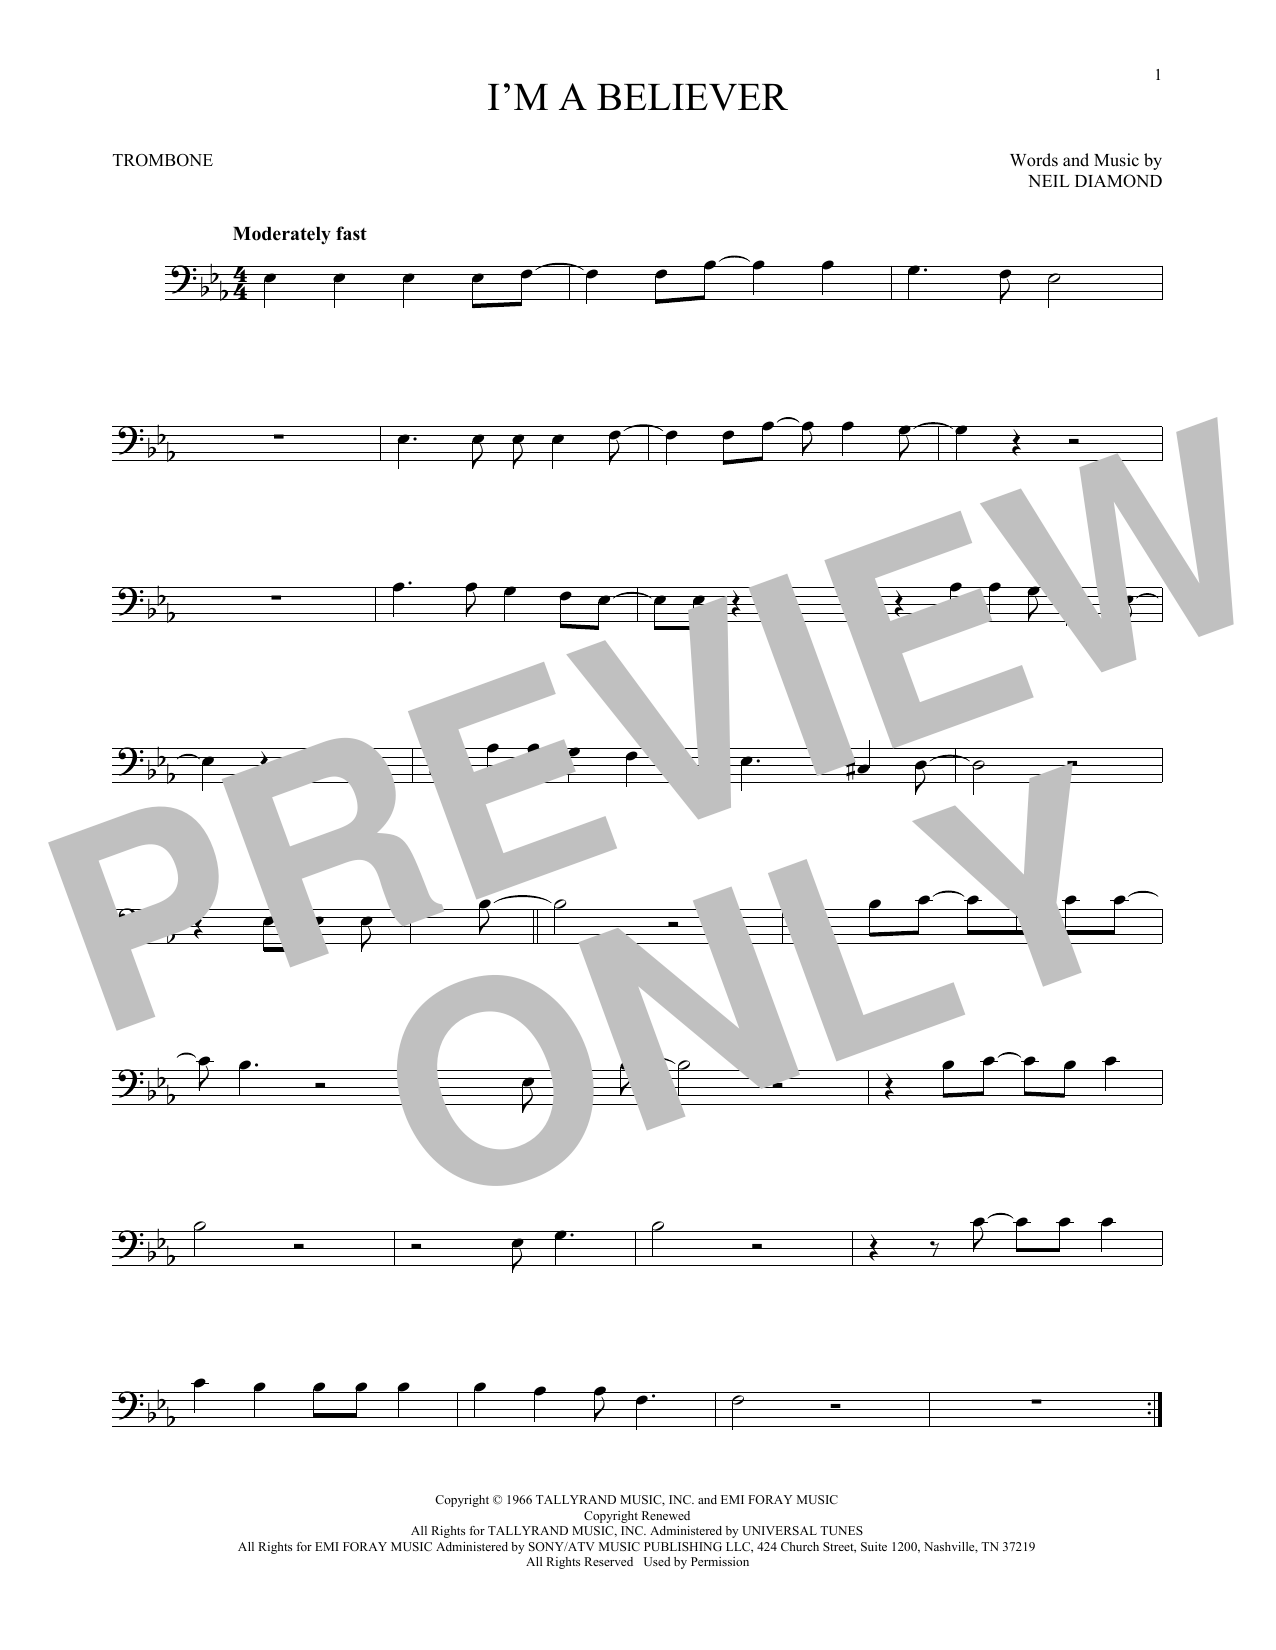 I'm A Believer (Trombone Solo)